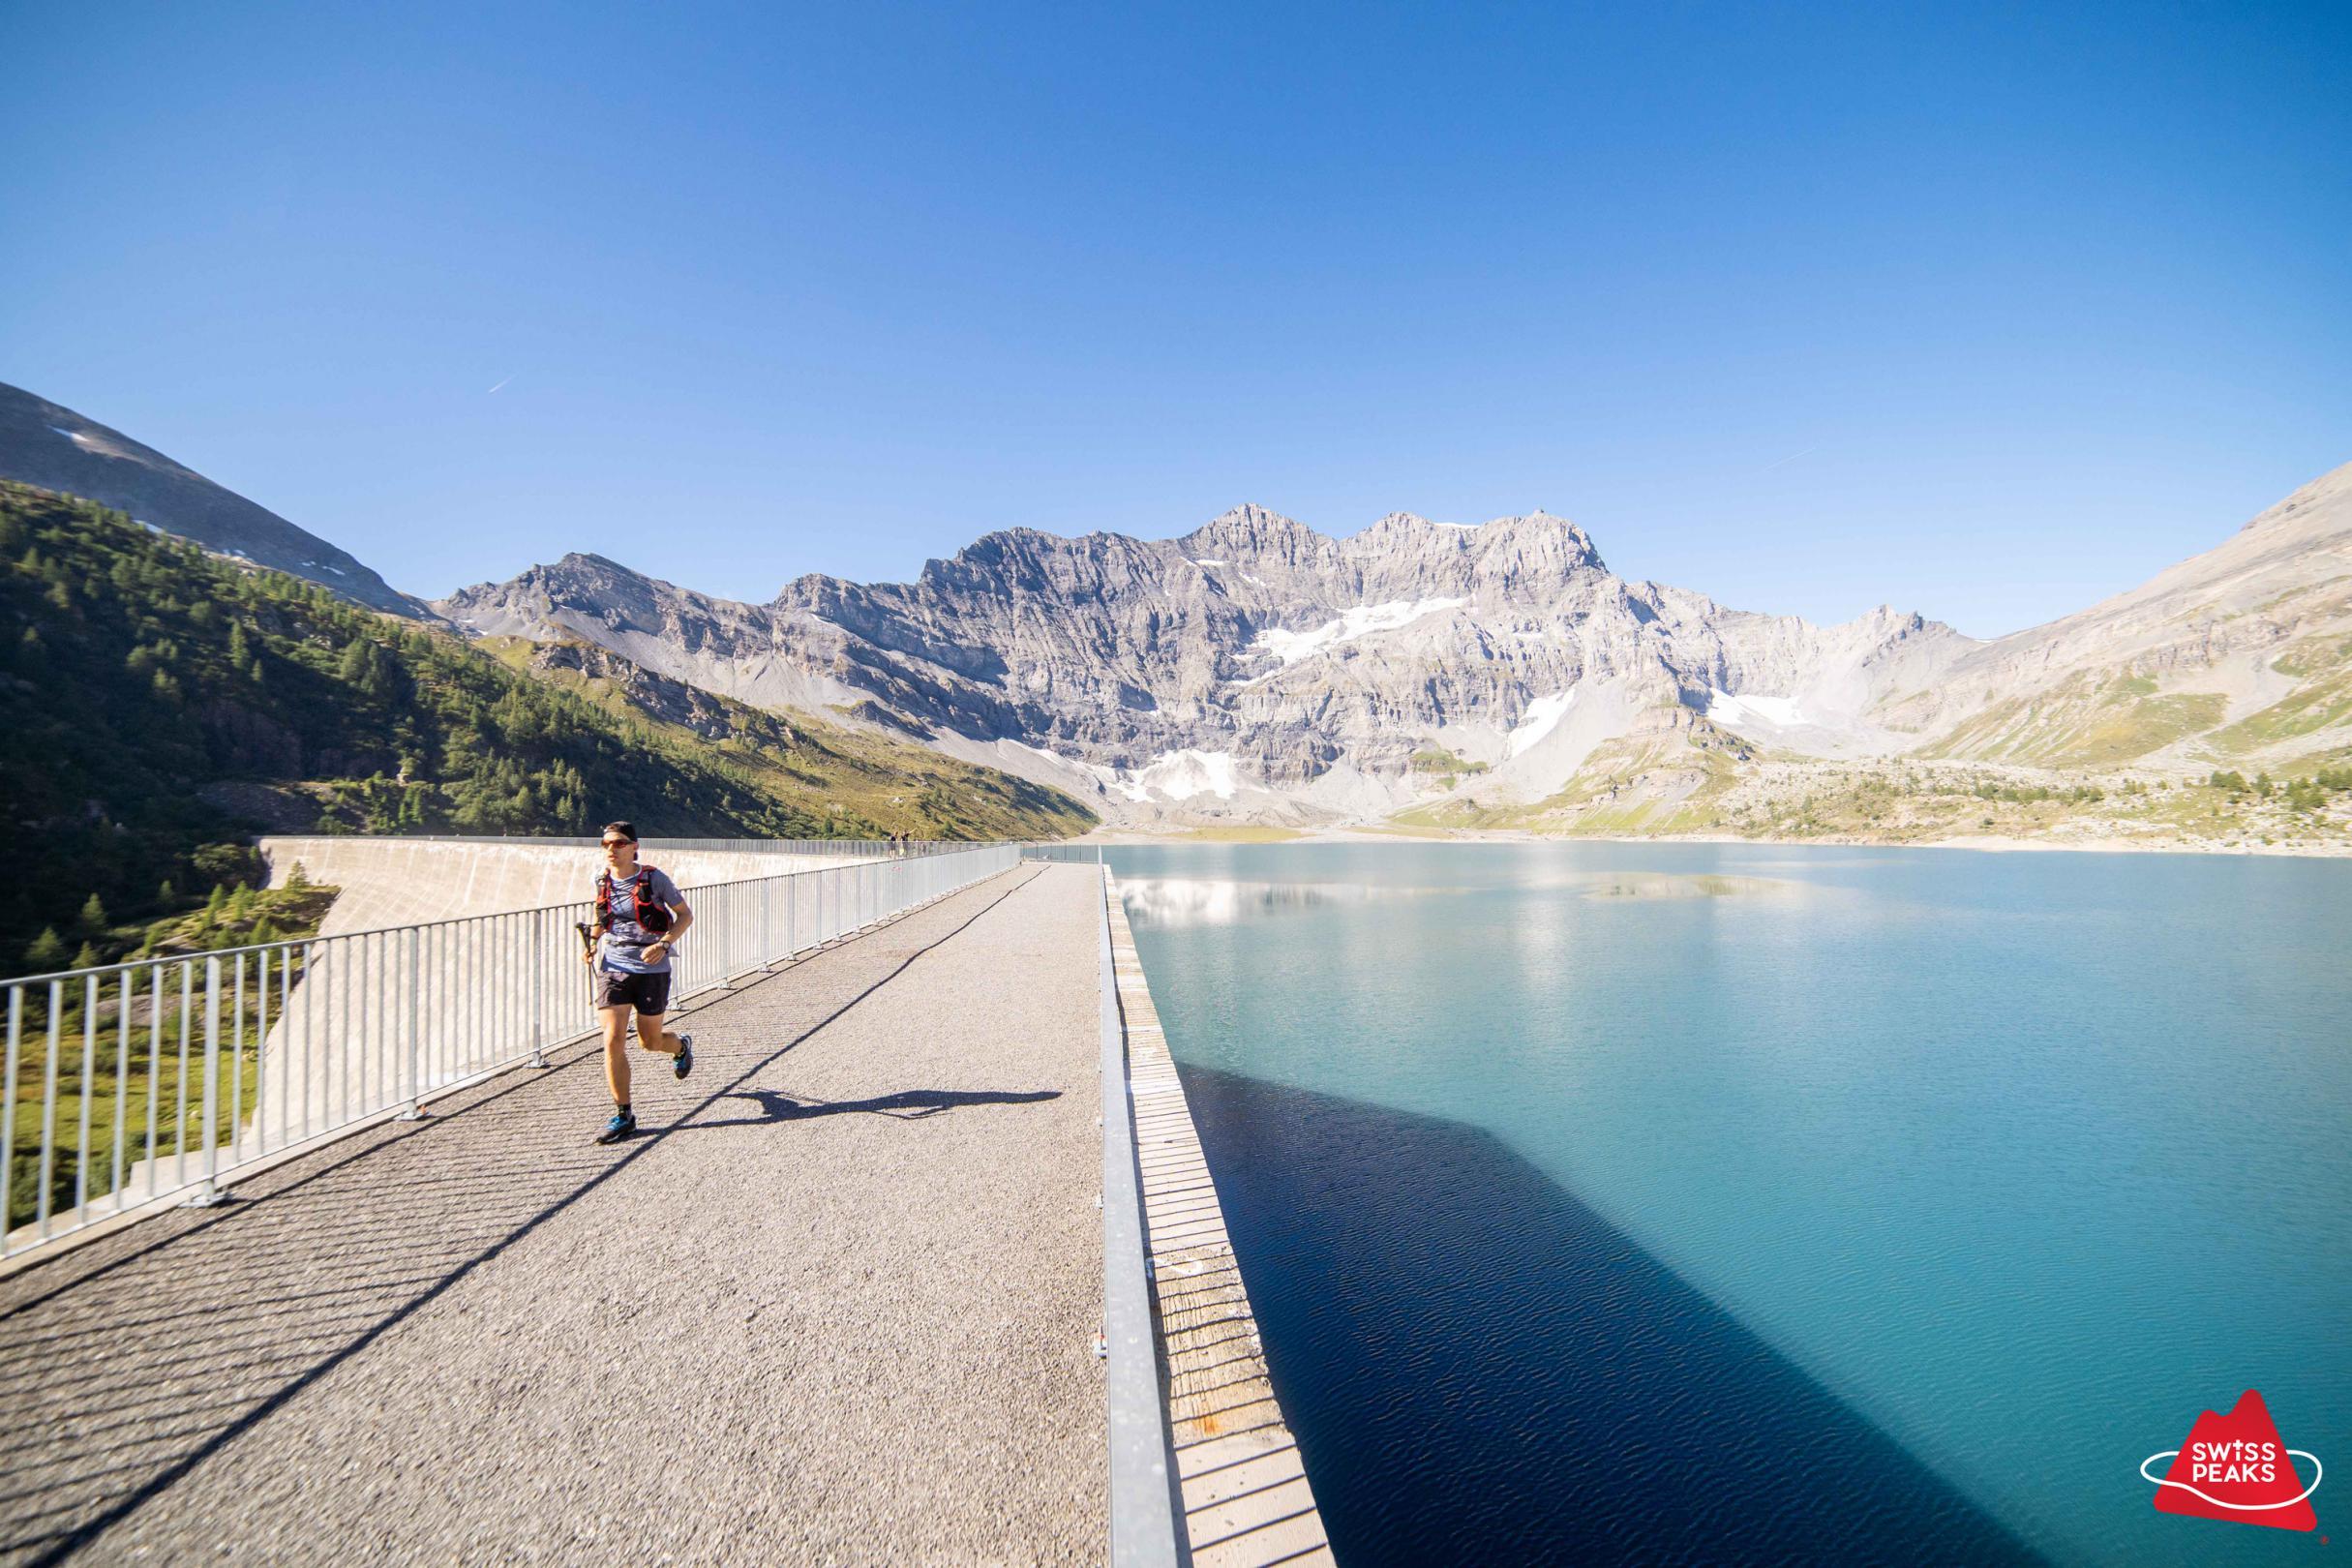 SwissPeaks Trail_Coureur 2 devant Barrage.jpg